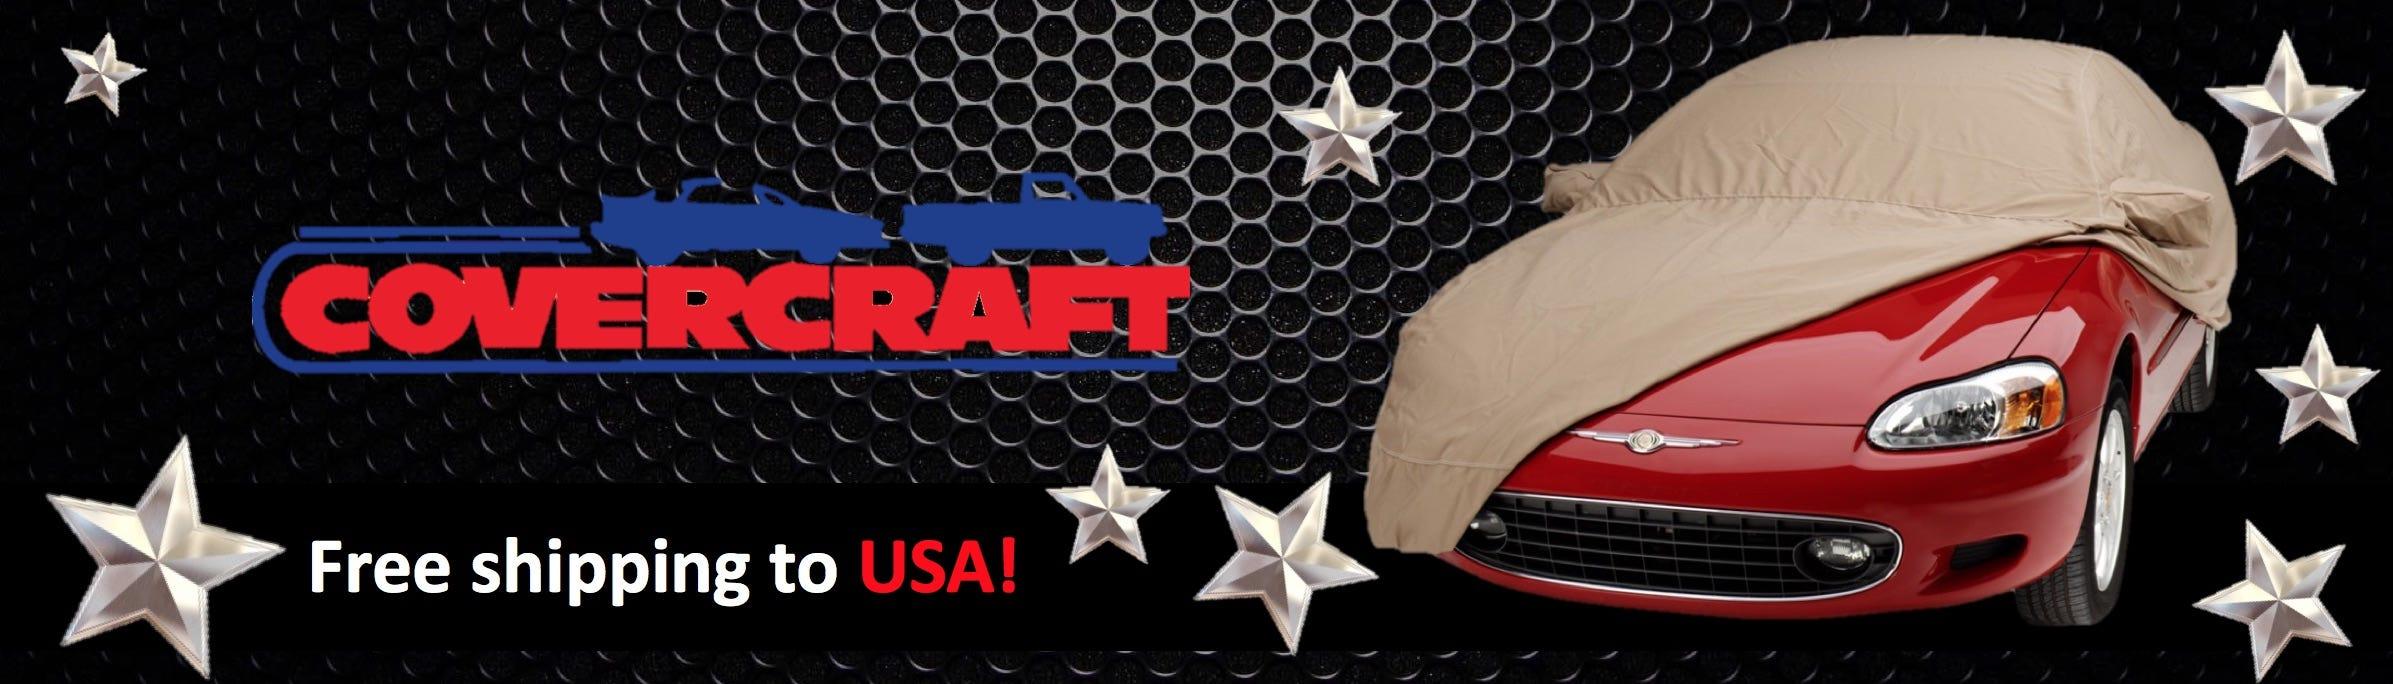 Covercraft Brand Banner - US